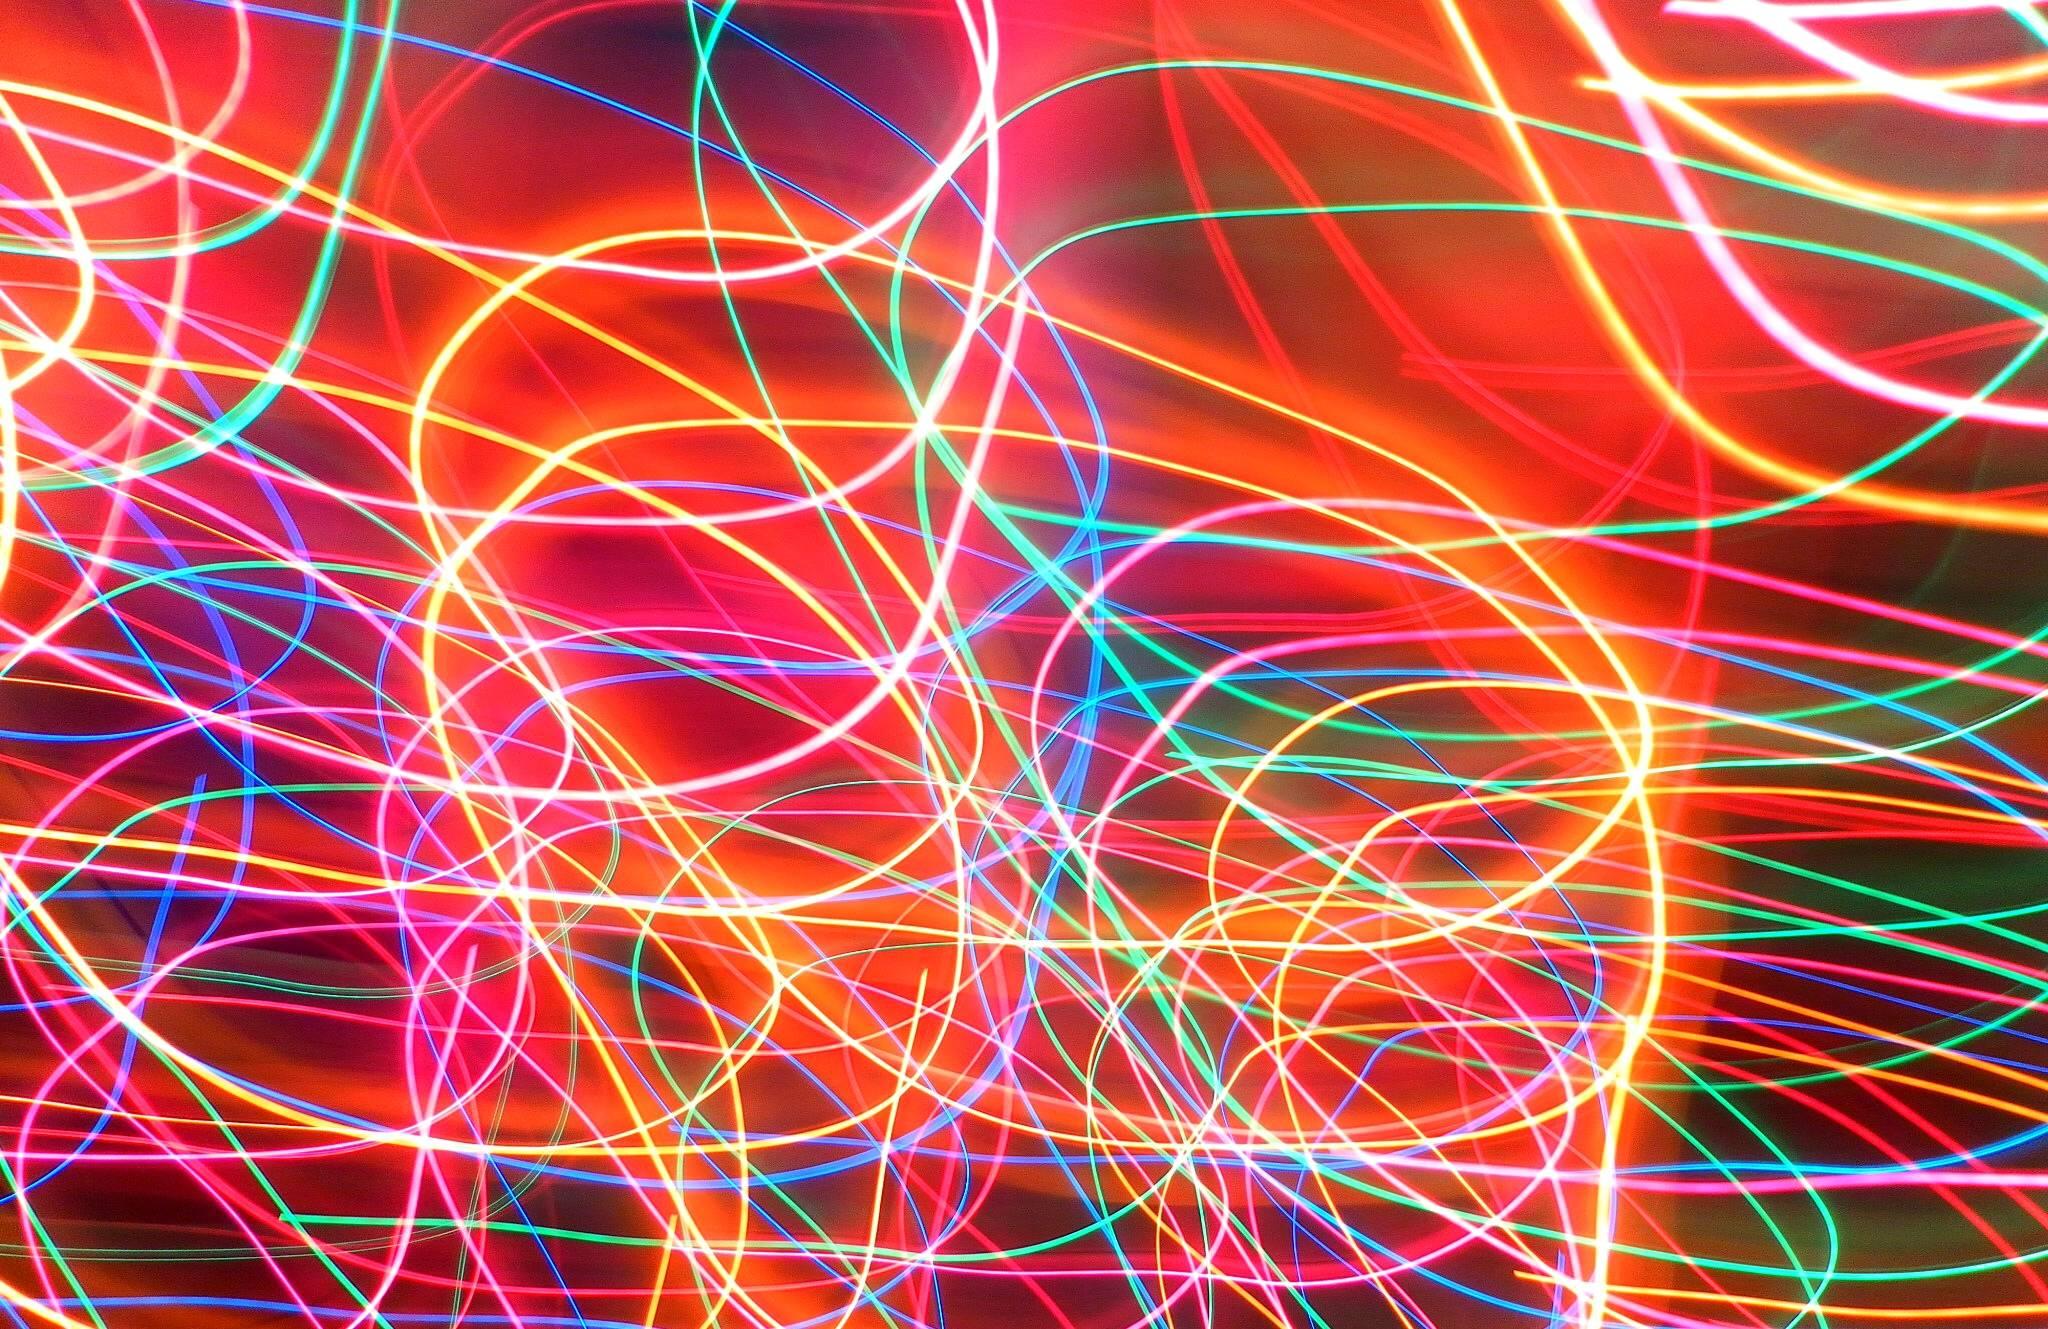 Neon Light Backgrounds - Wallpaper Cave